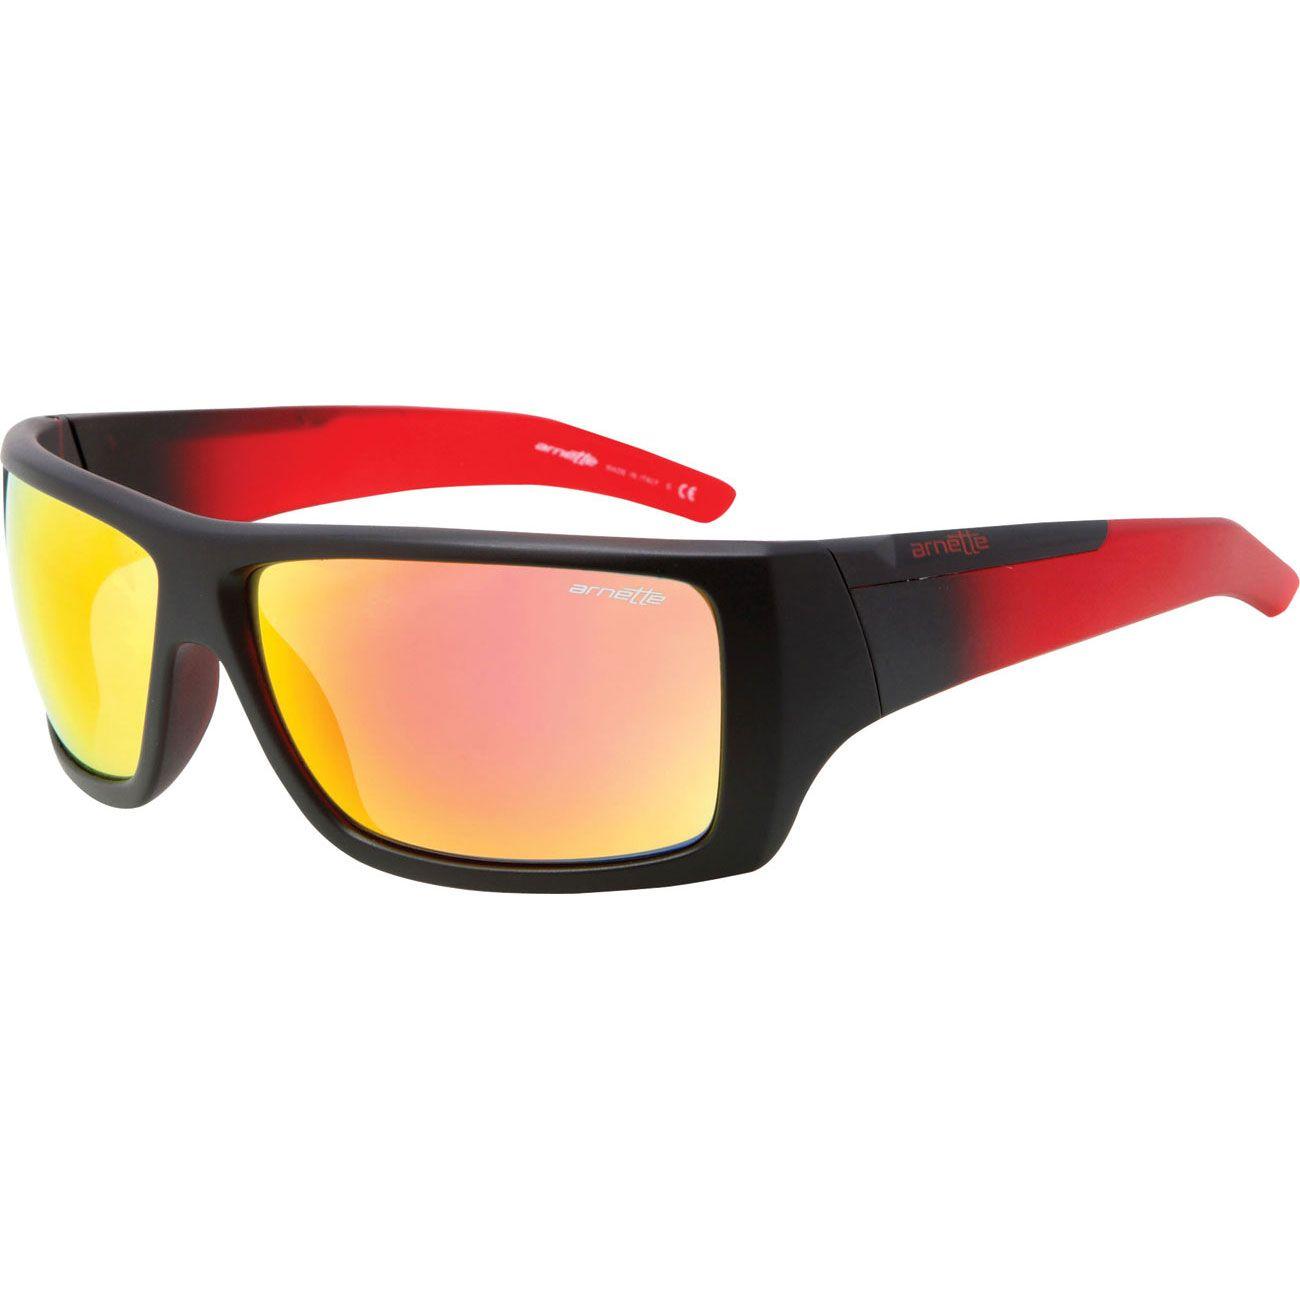 c1d813cc5f Models of arnette sunglasses google search awesome pinterest jpg 1300x1300 Arnette  sunglass models